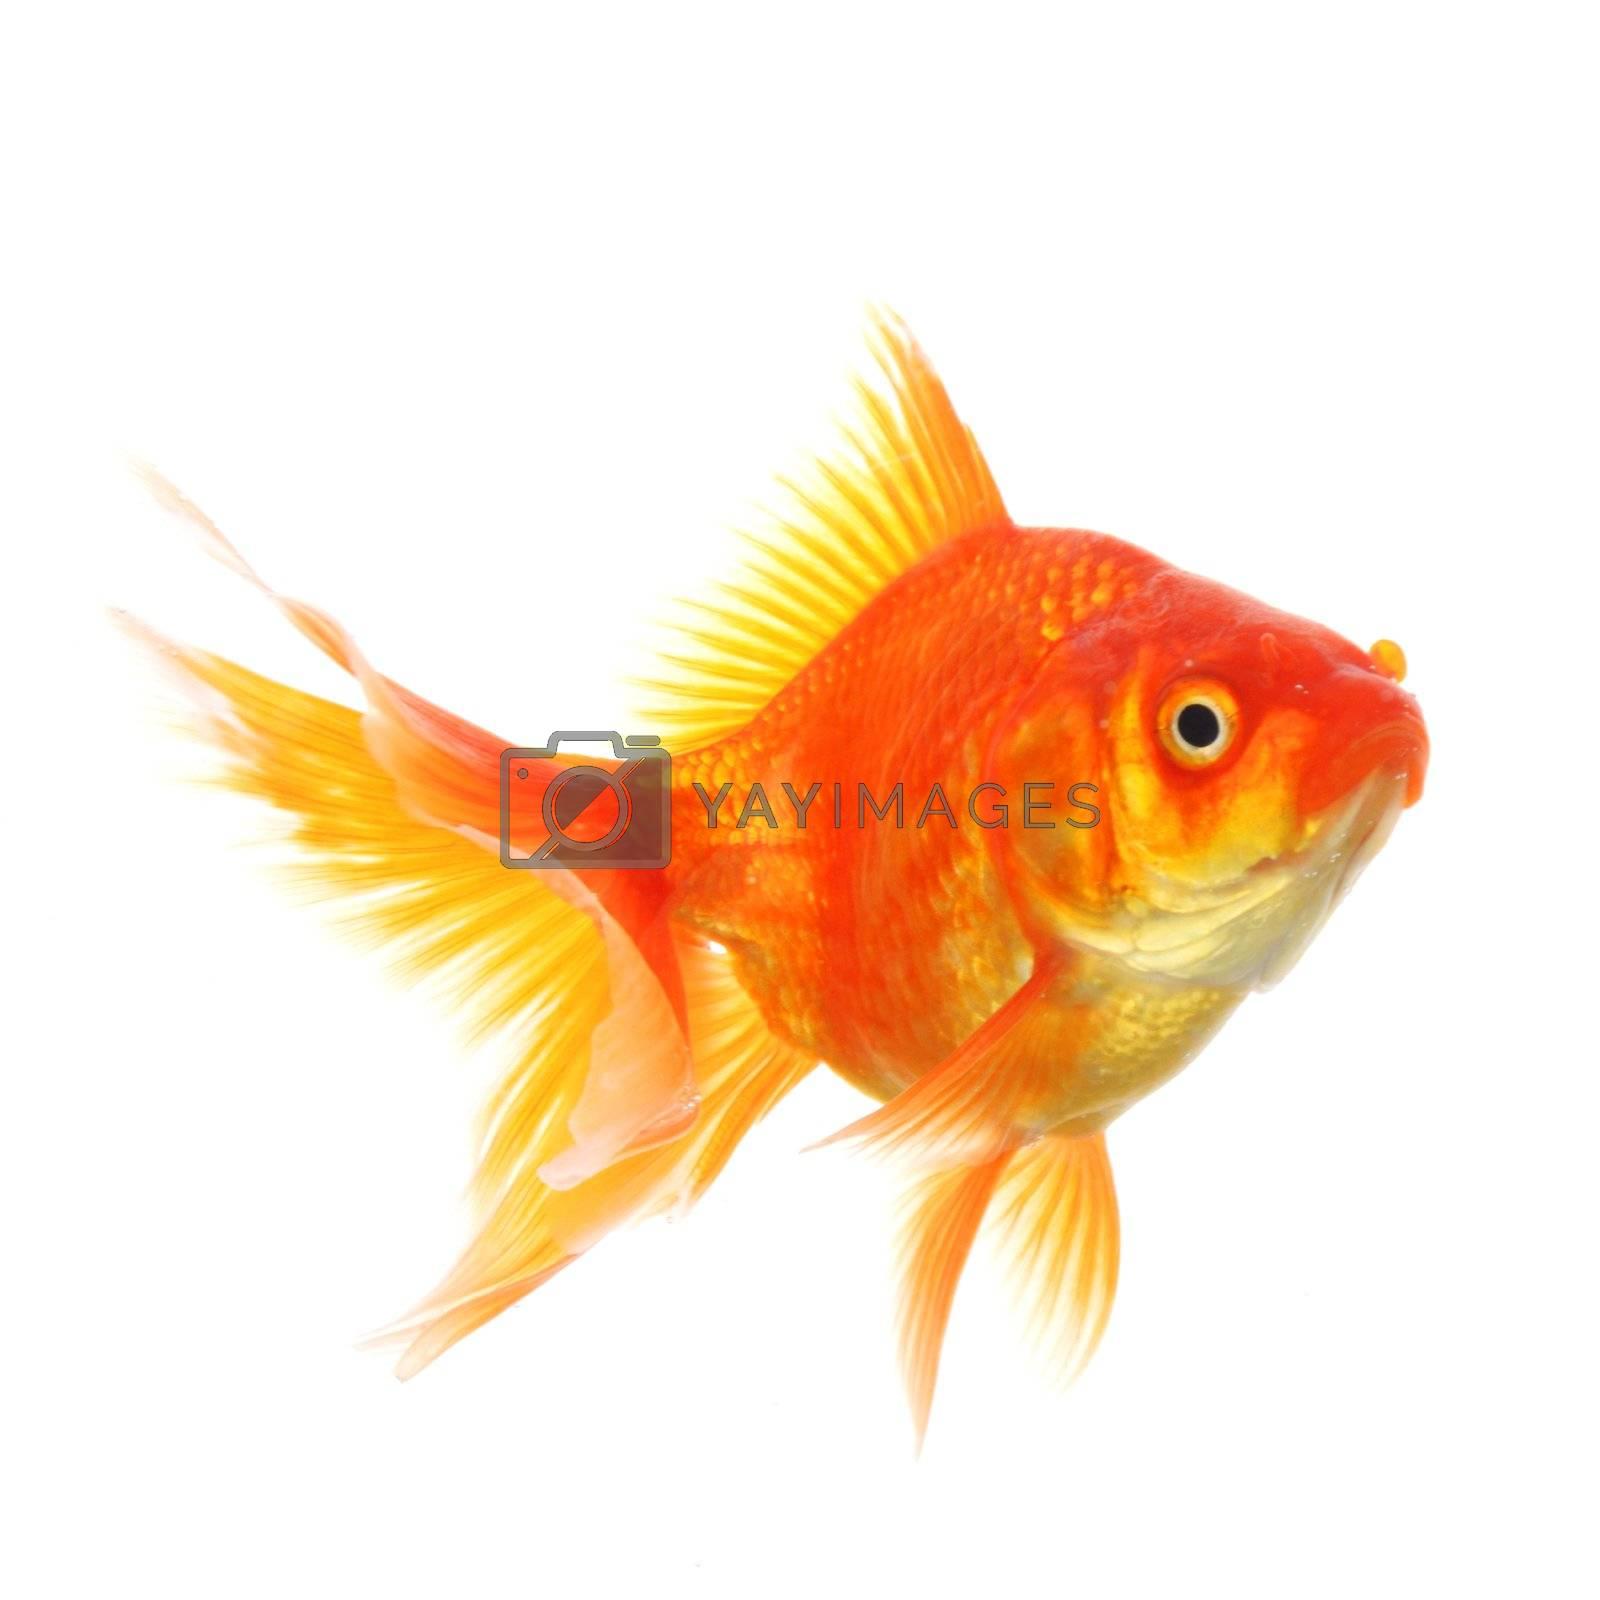 goldfish macro isolated on white background showing pet or animal concept